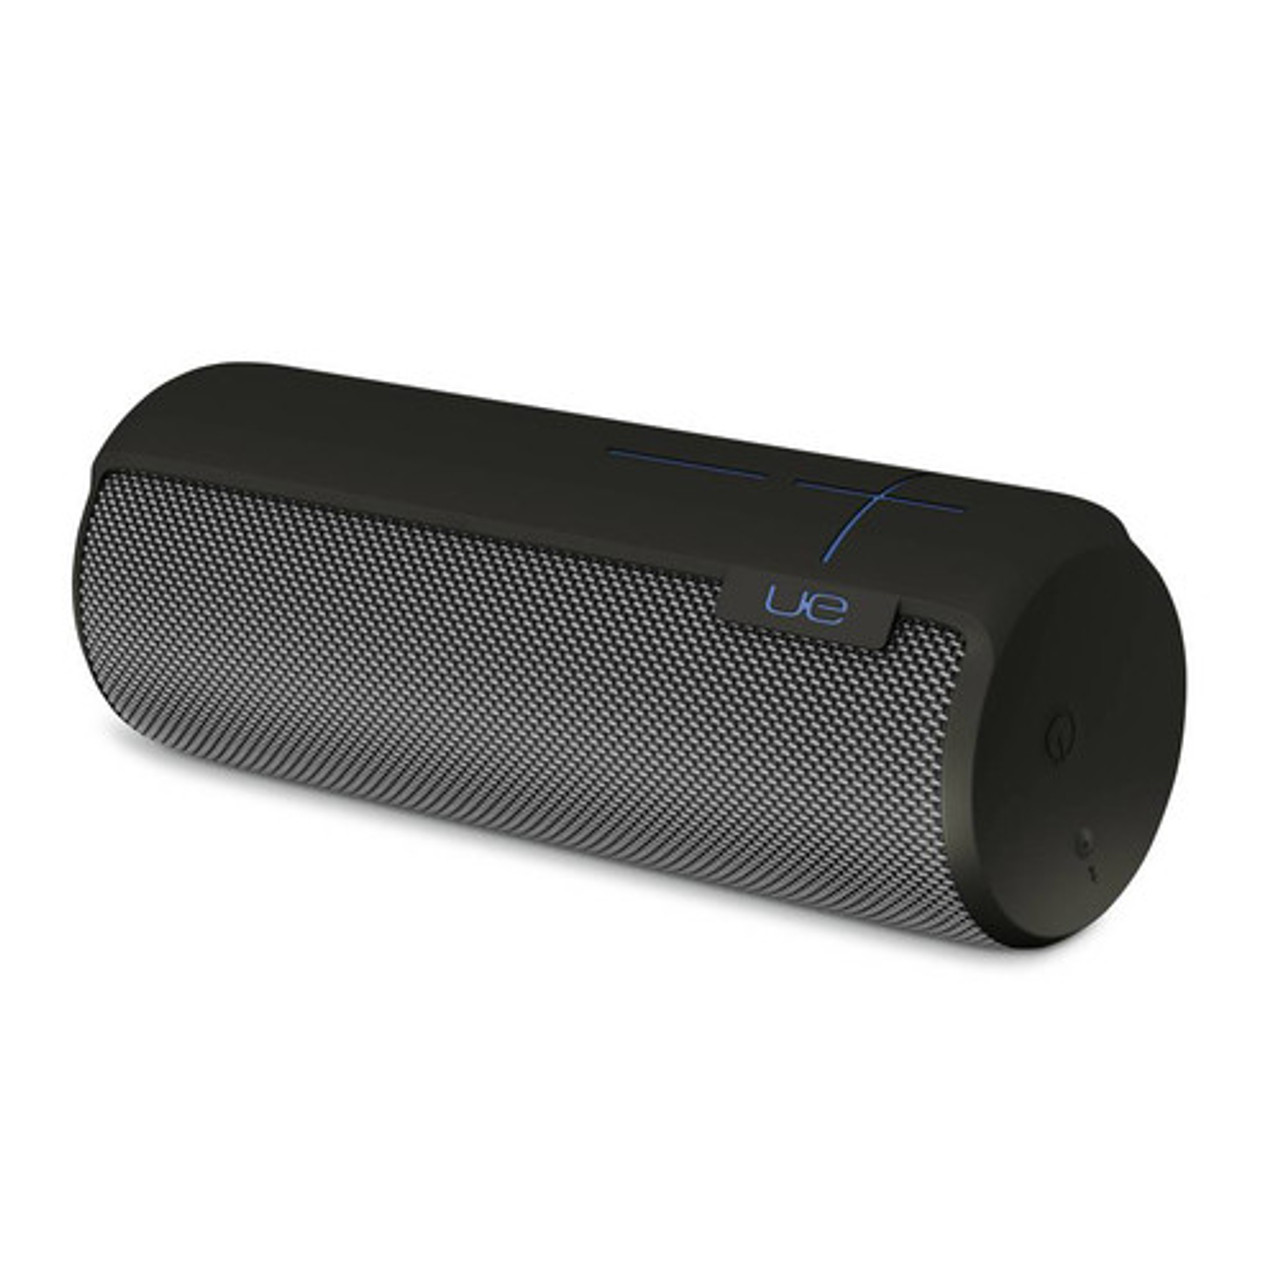 UE S984-000436X-R MEGABOOM Wireless Bluetooth Speaker, Black - Certified Refurbished